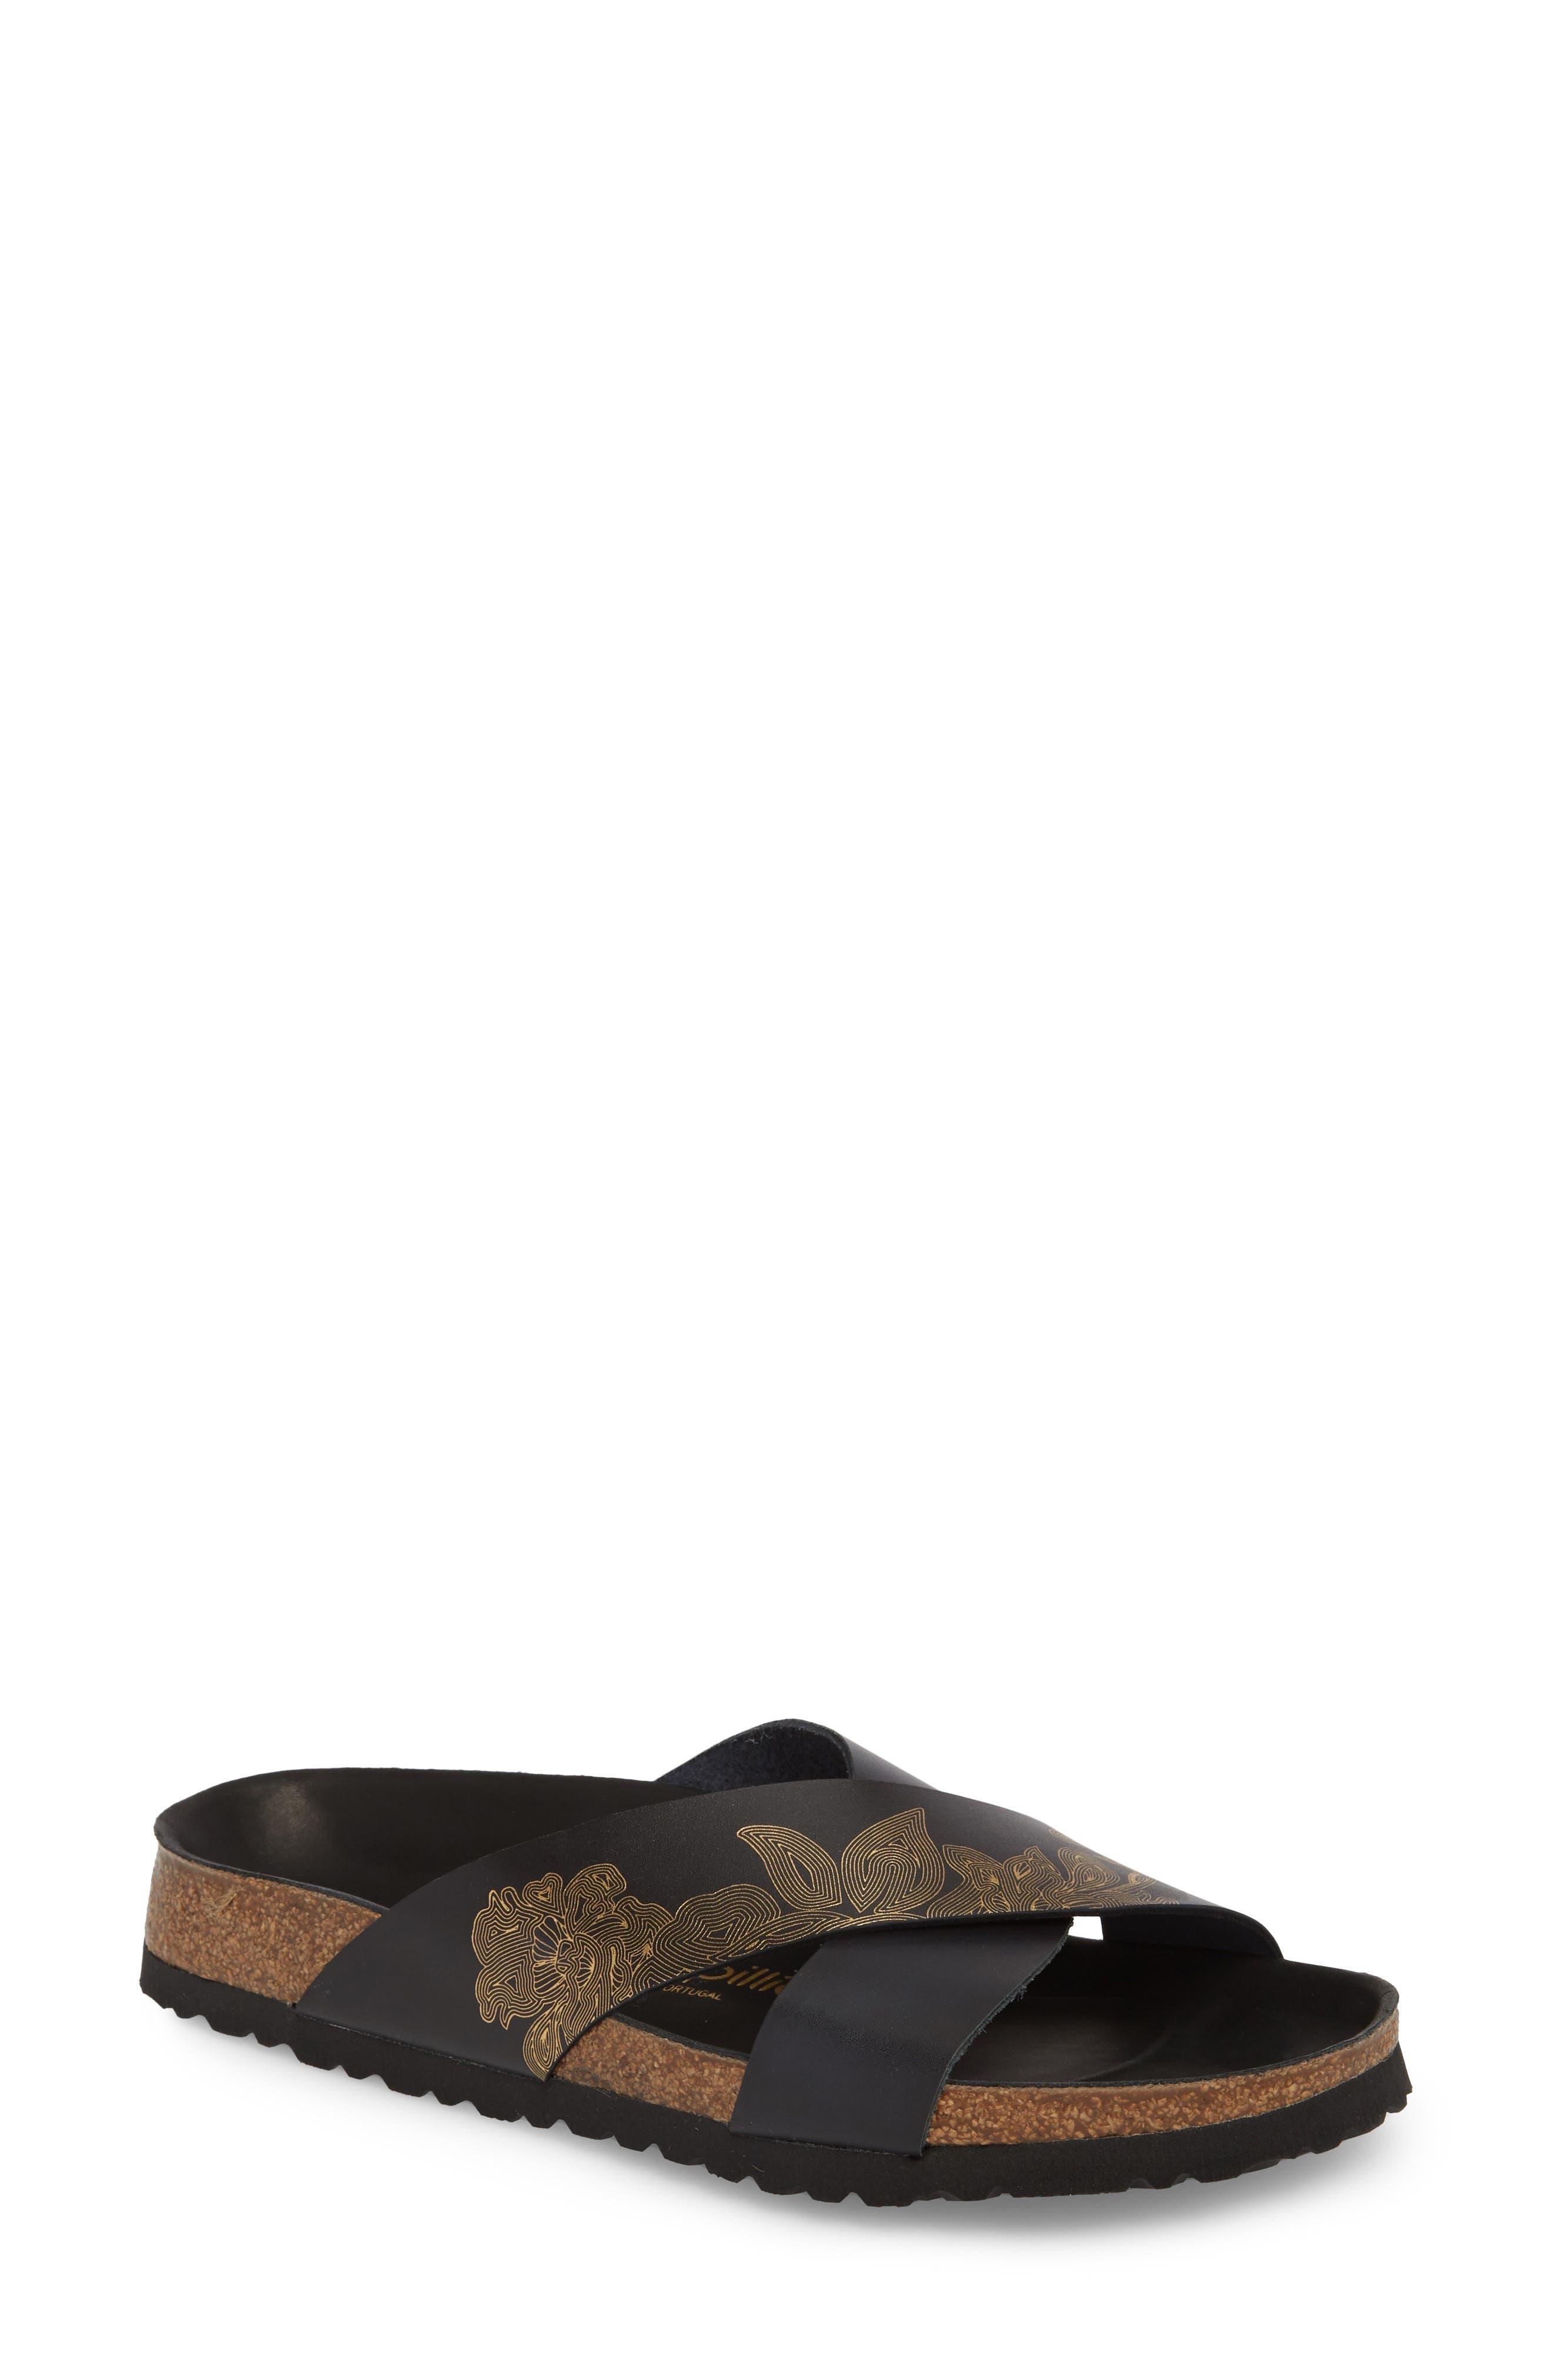 Papillio by Birkenstock Daytona Hex Slide Sandal,                         Main,                         color, Ornaments Black Leather